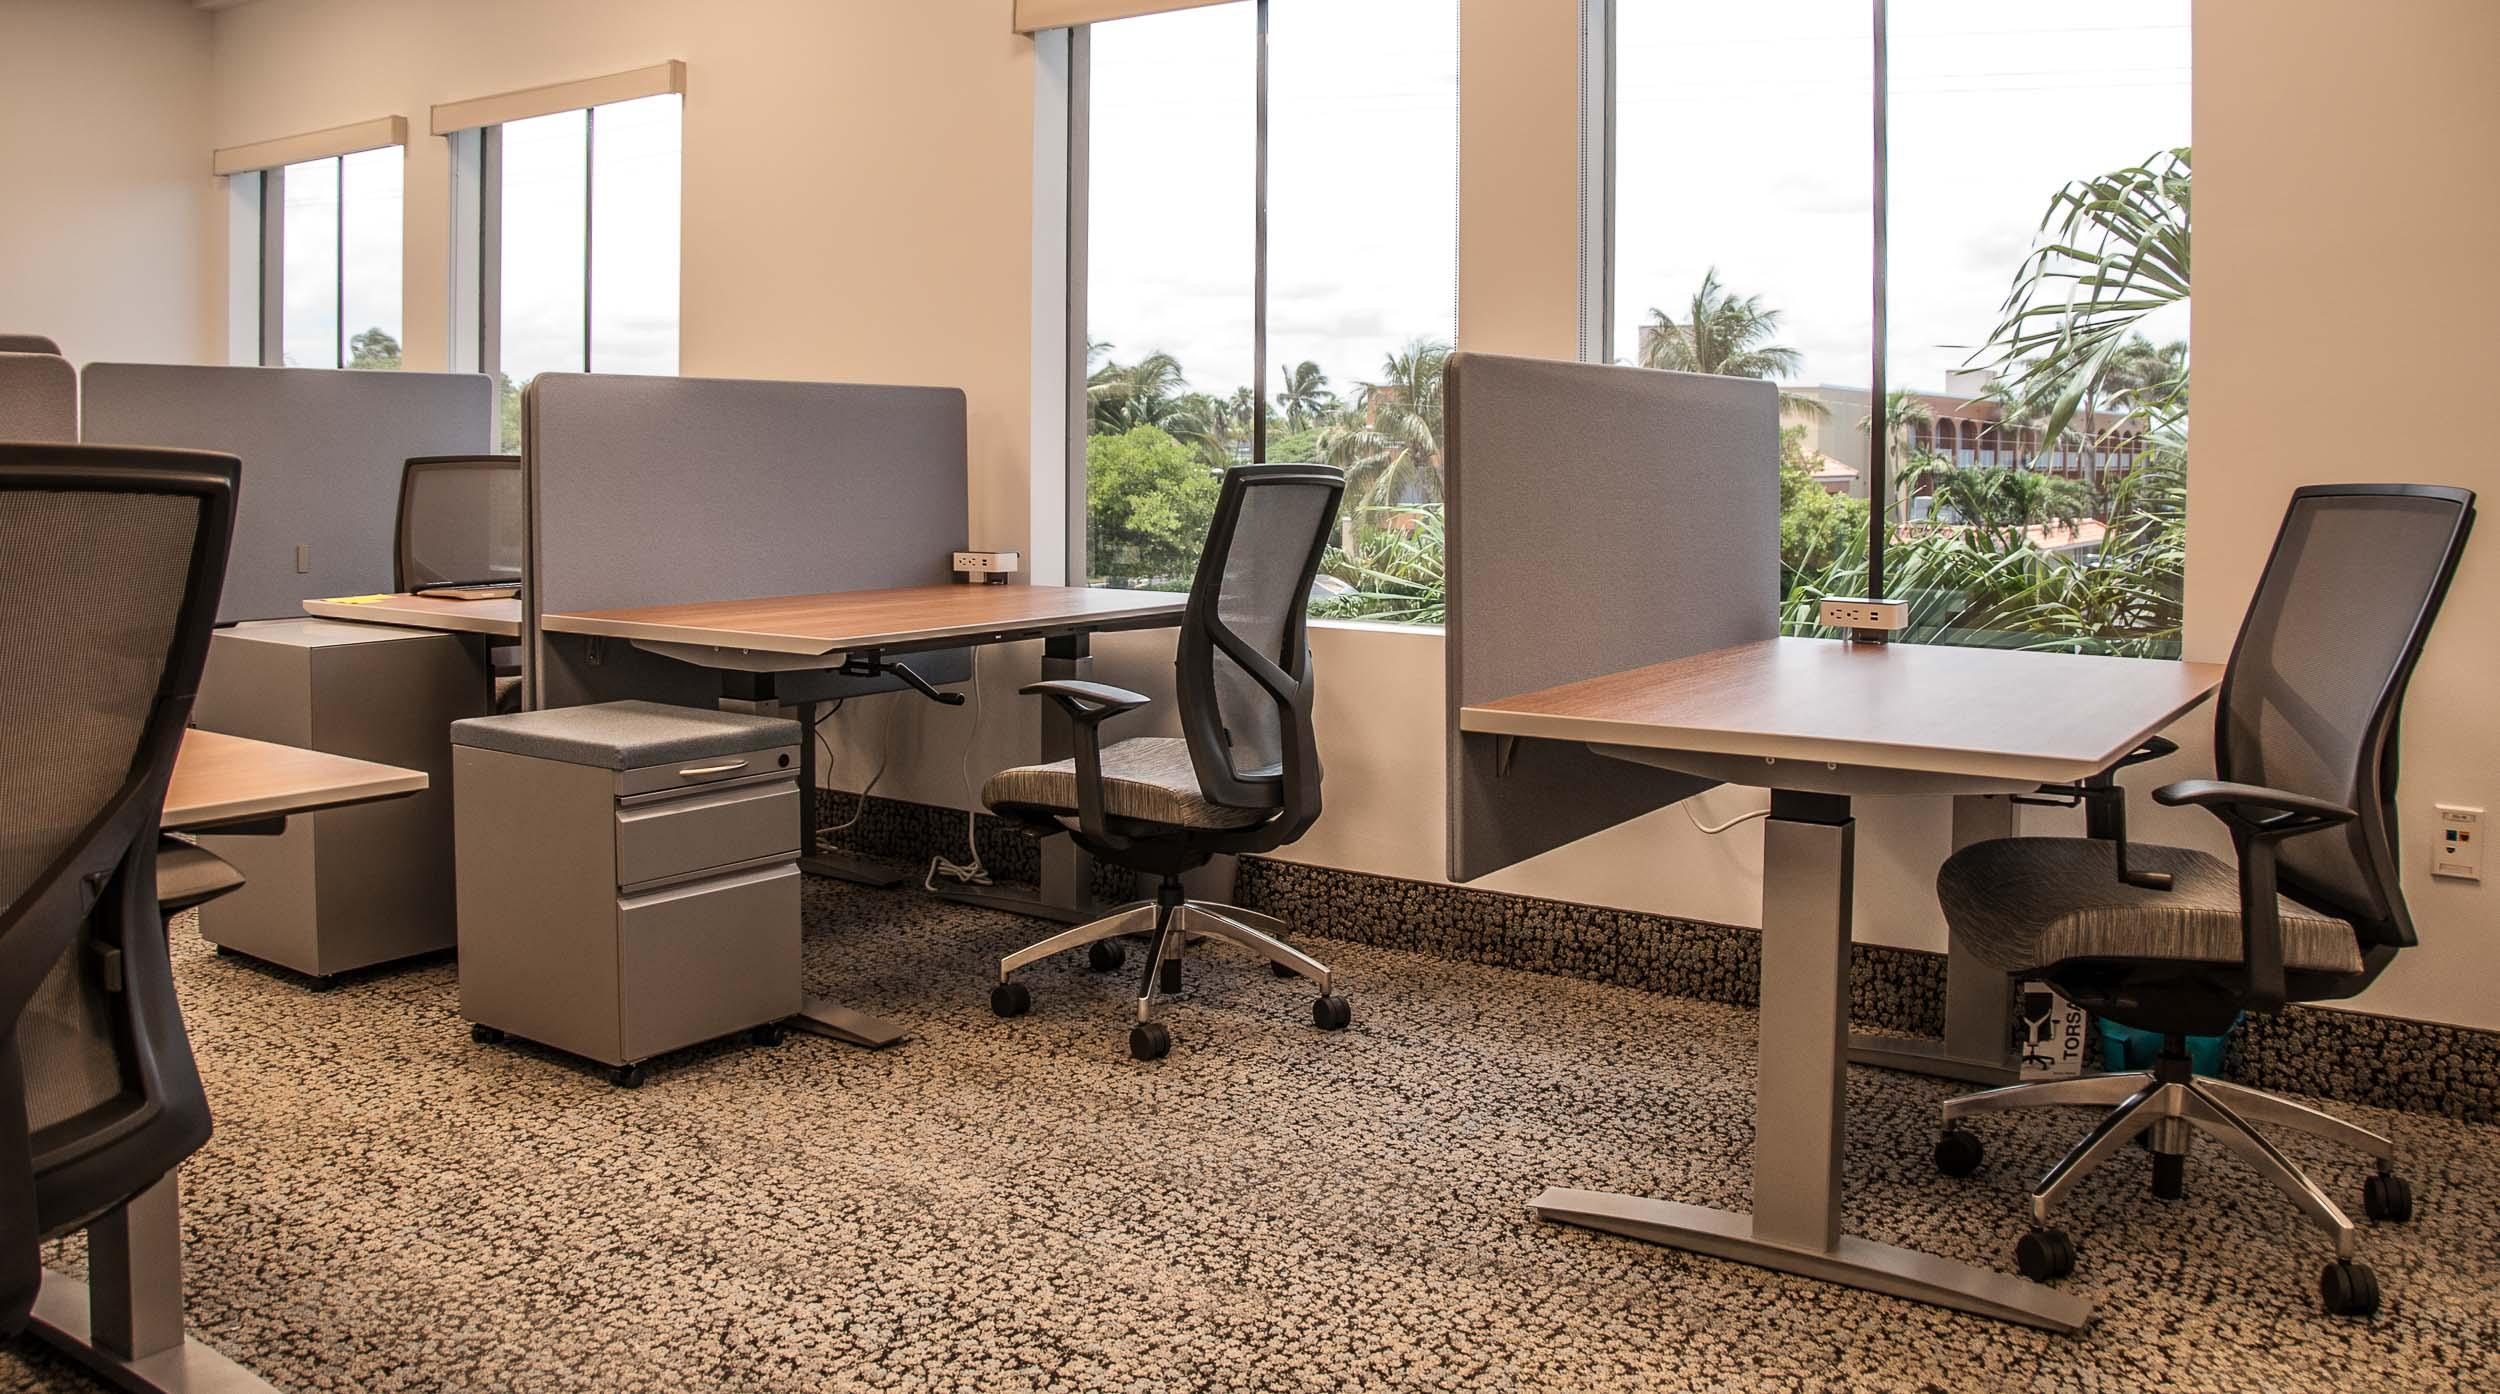 Electric Height Adjustable Desks-3575.jpg